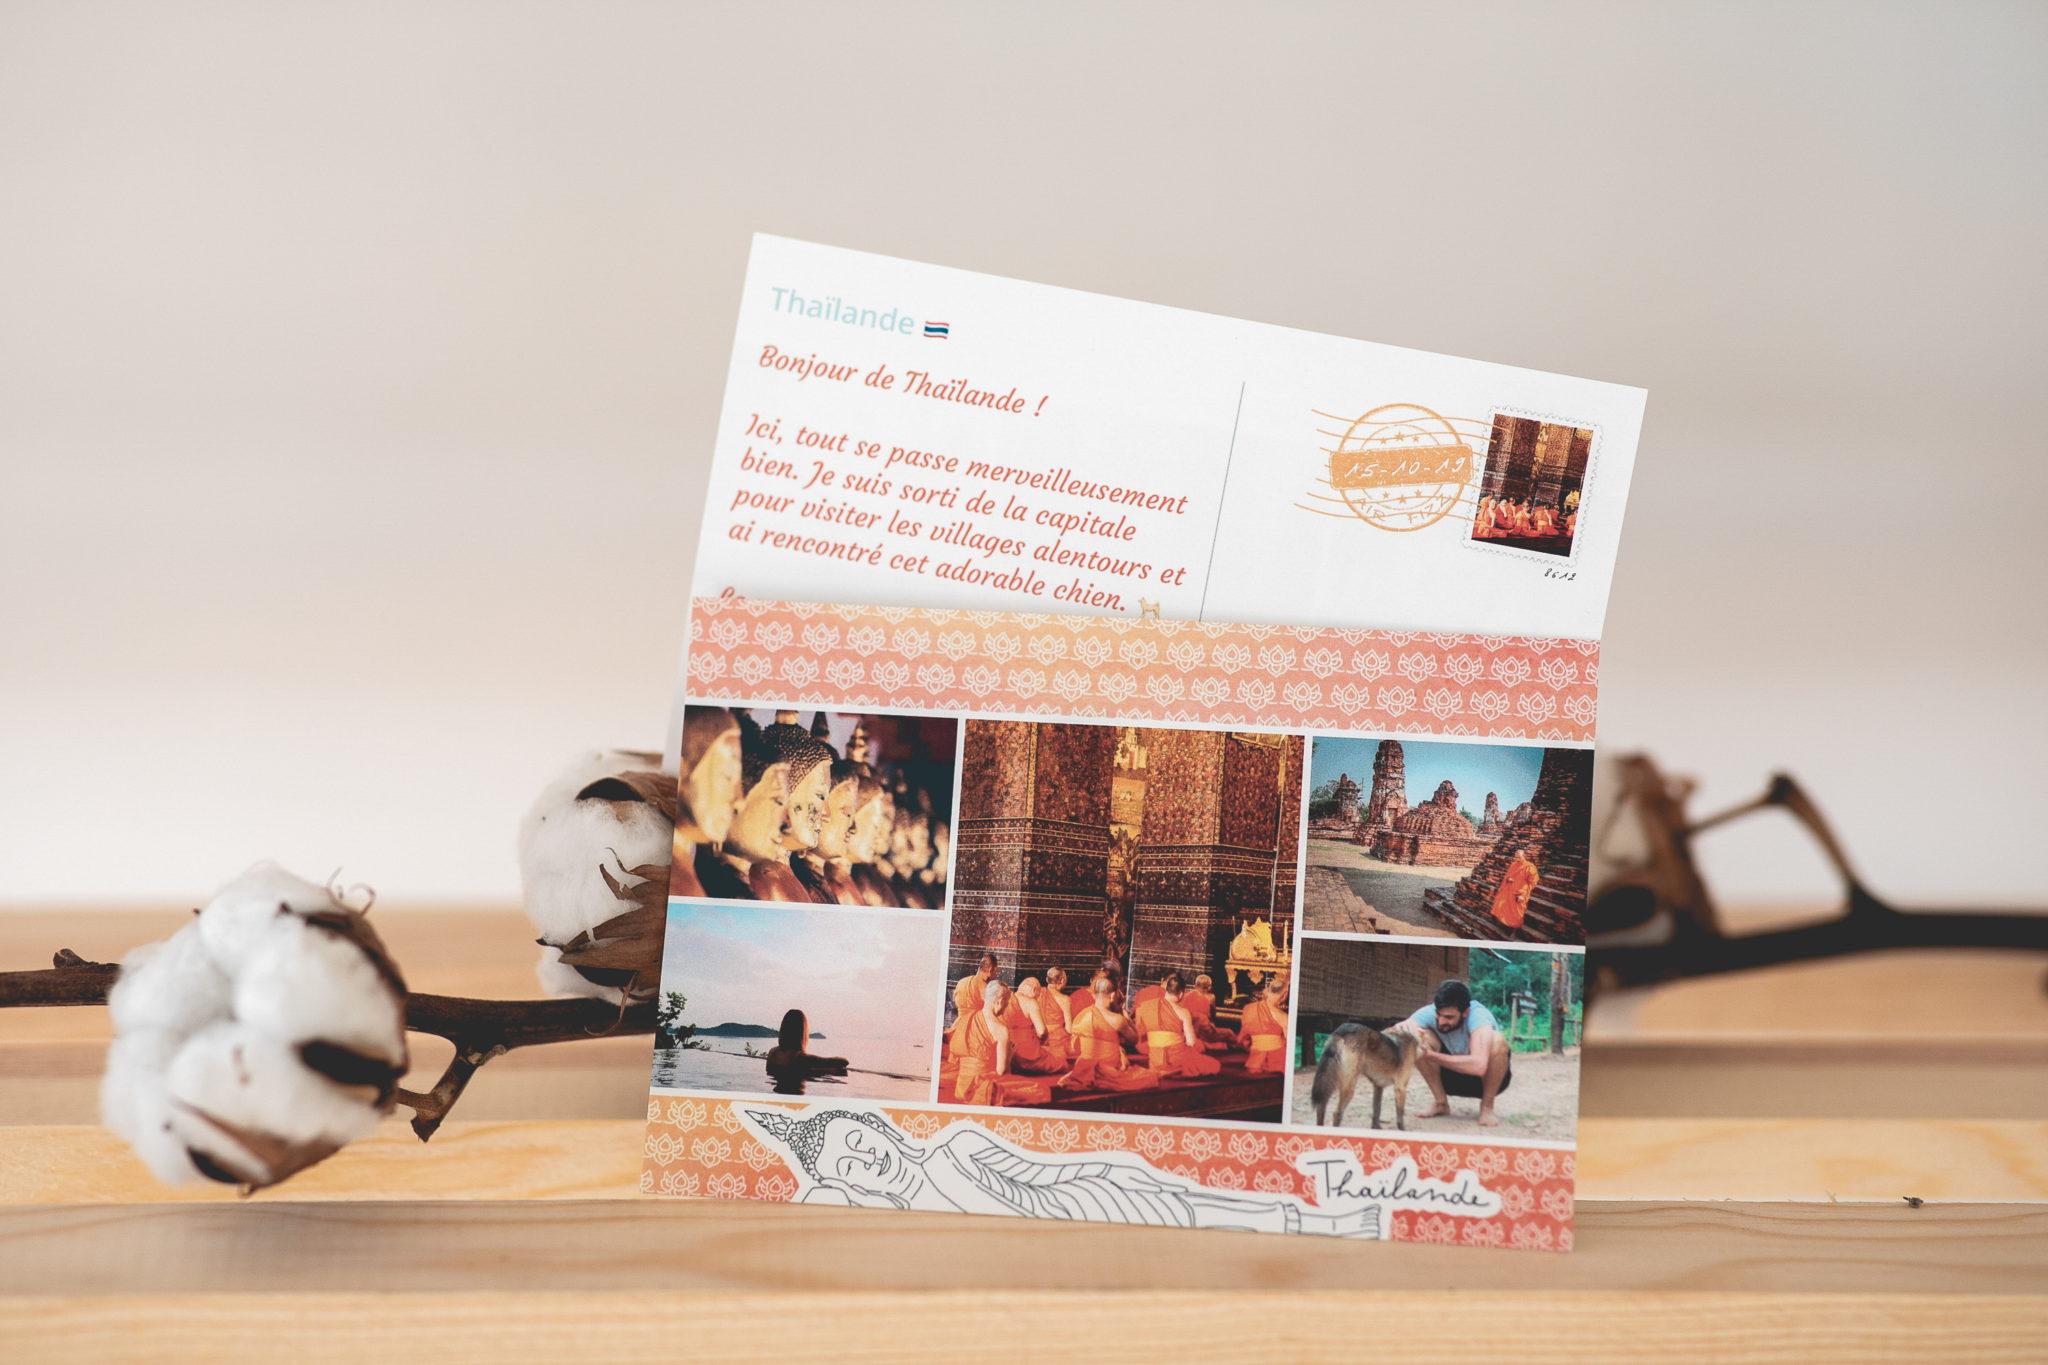 thailande carte postale personnalisee